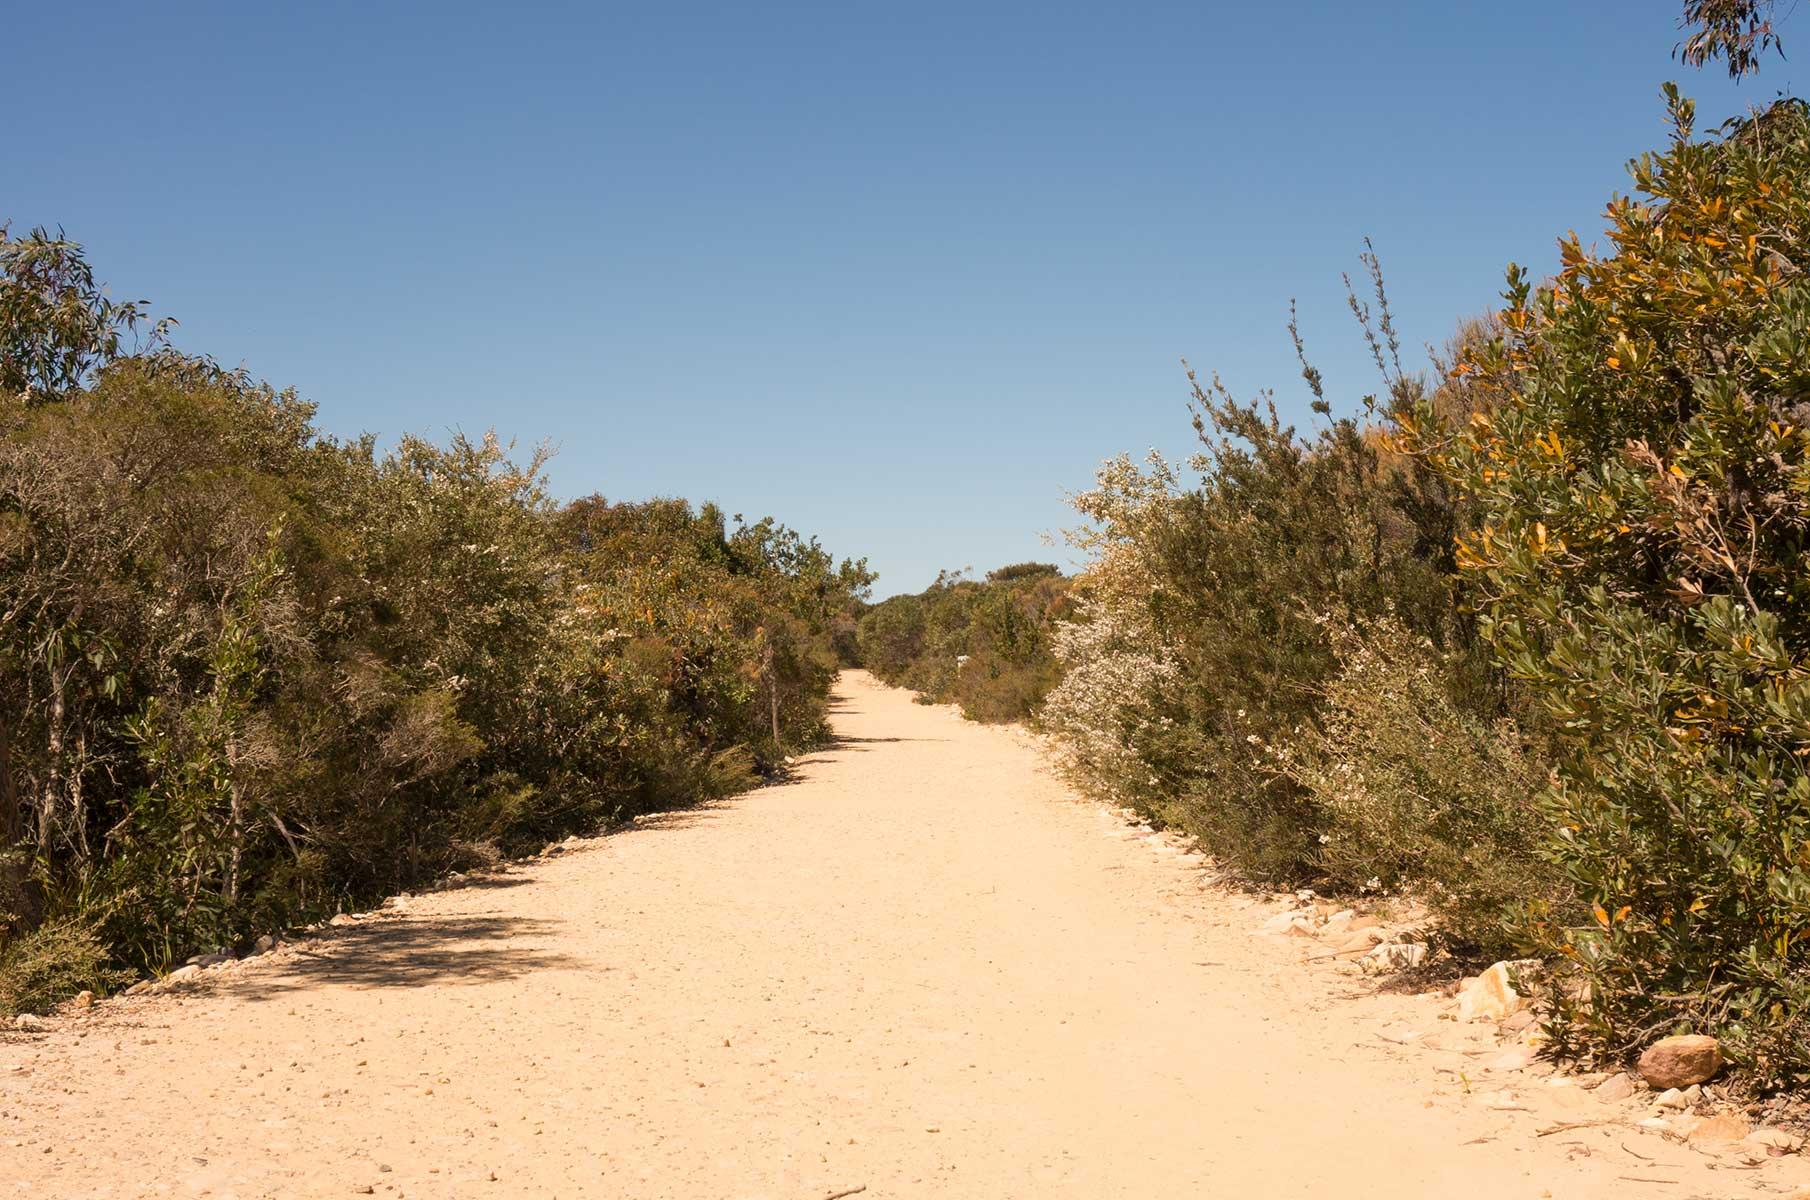 Royal National Park, Australien